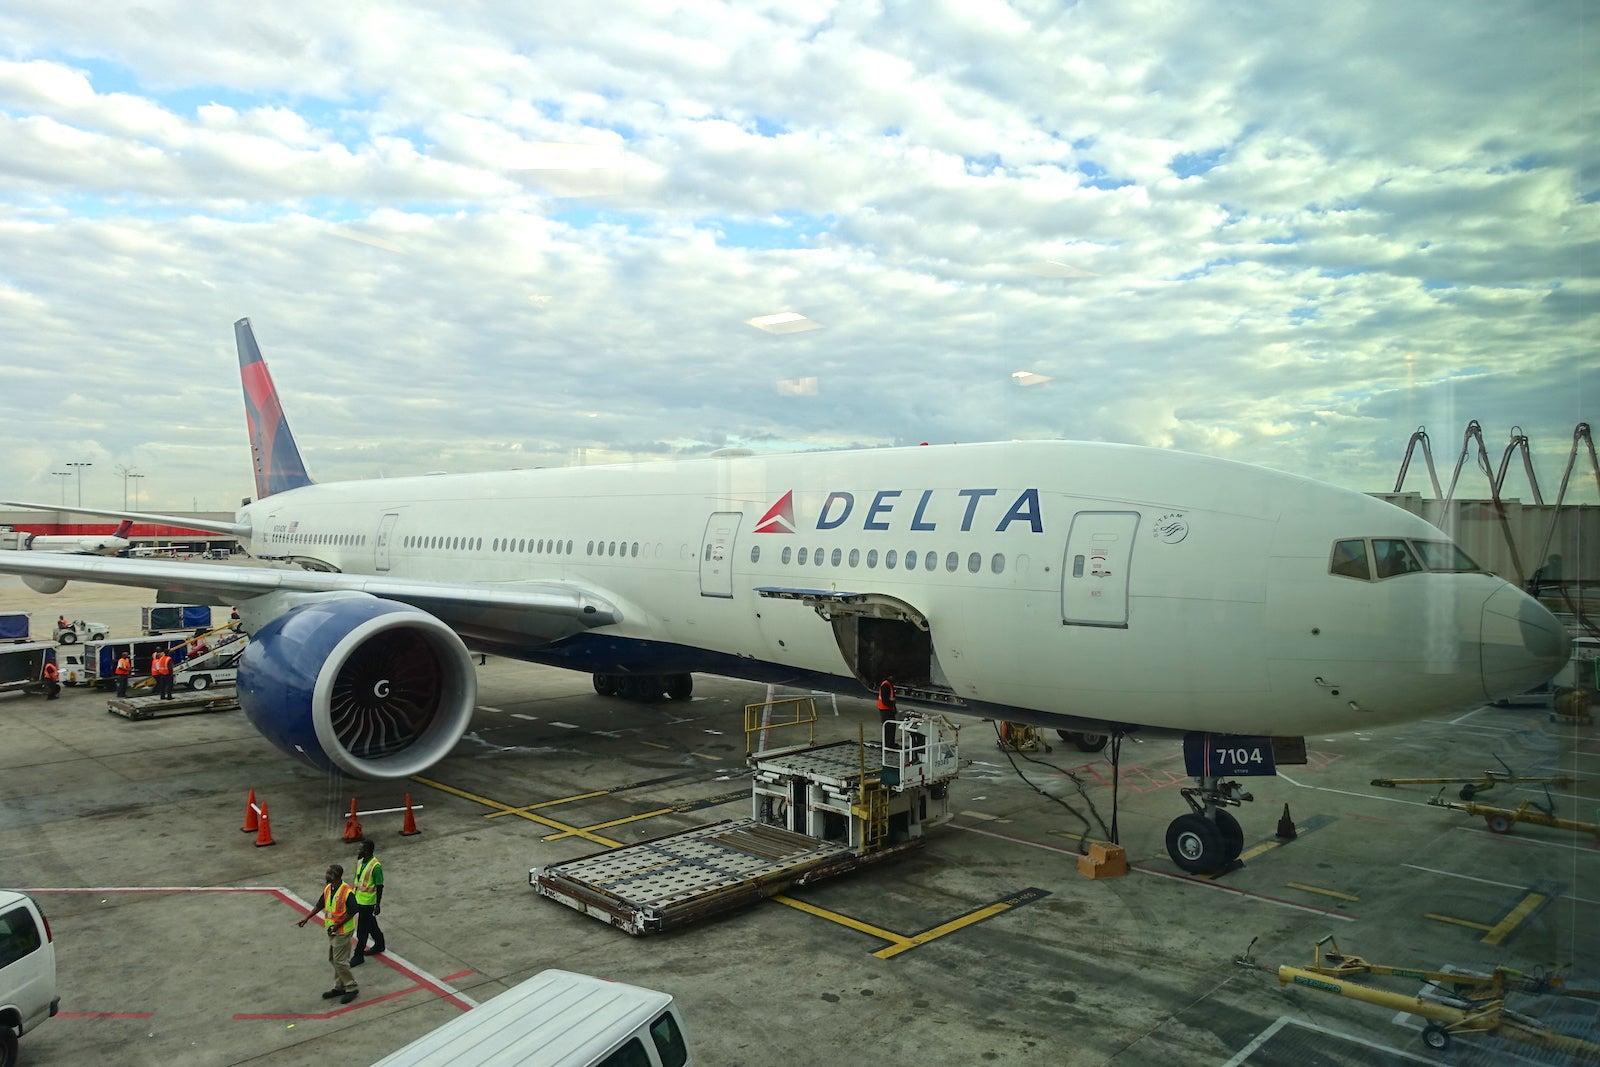 Flight Review: Delta (777-200LR) Business Class, LA to ATL